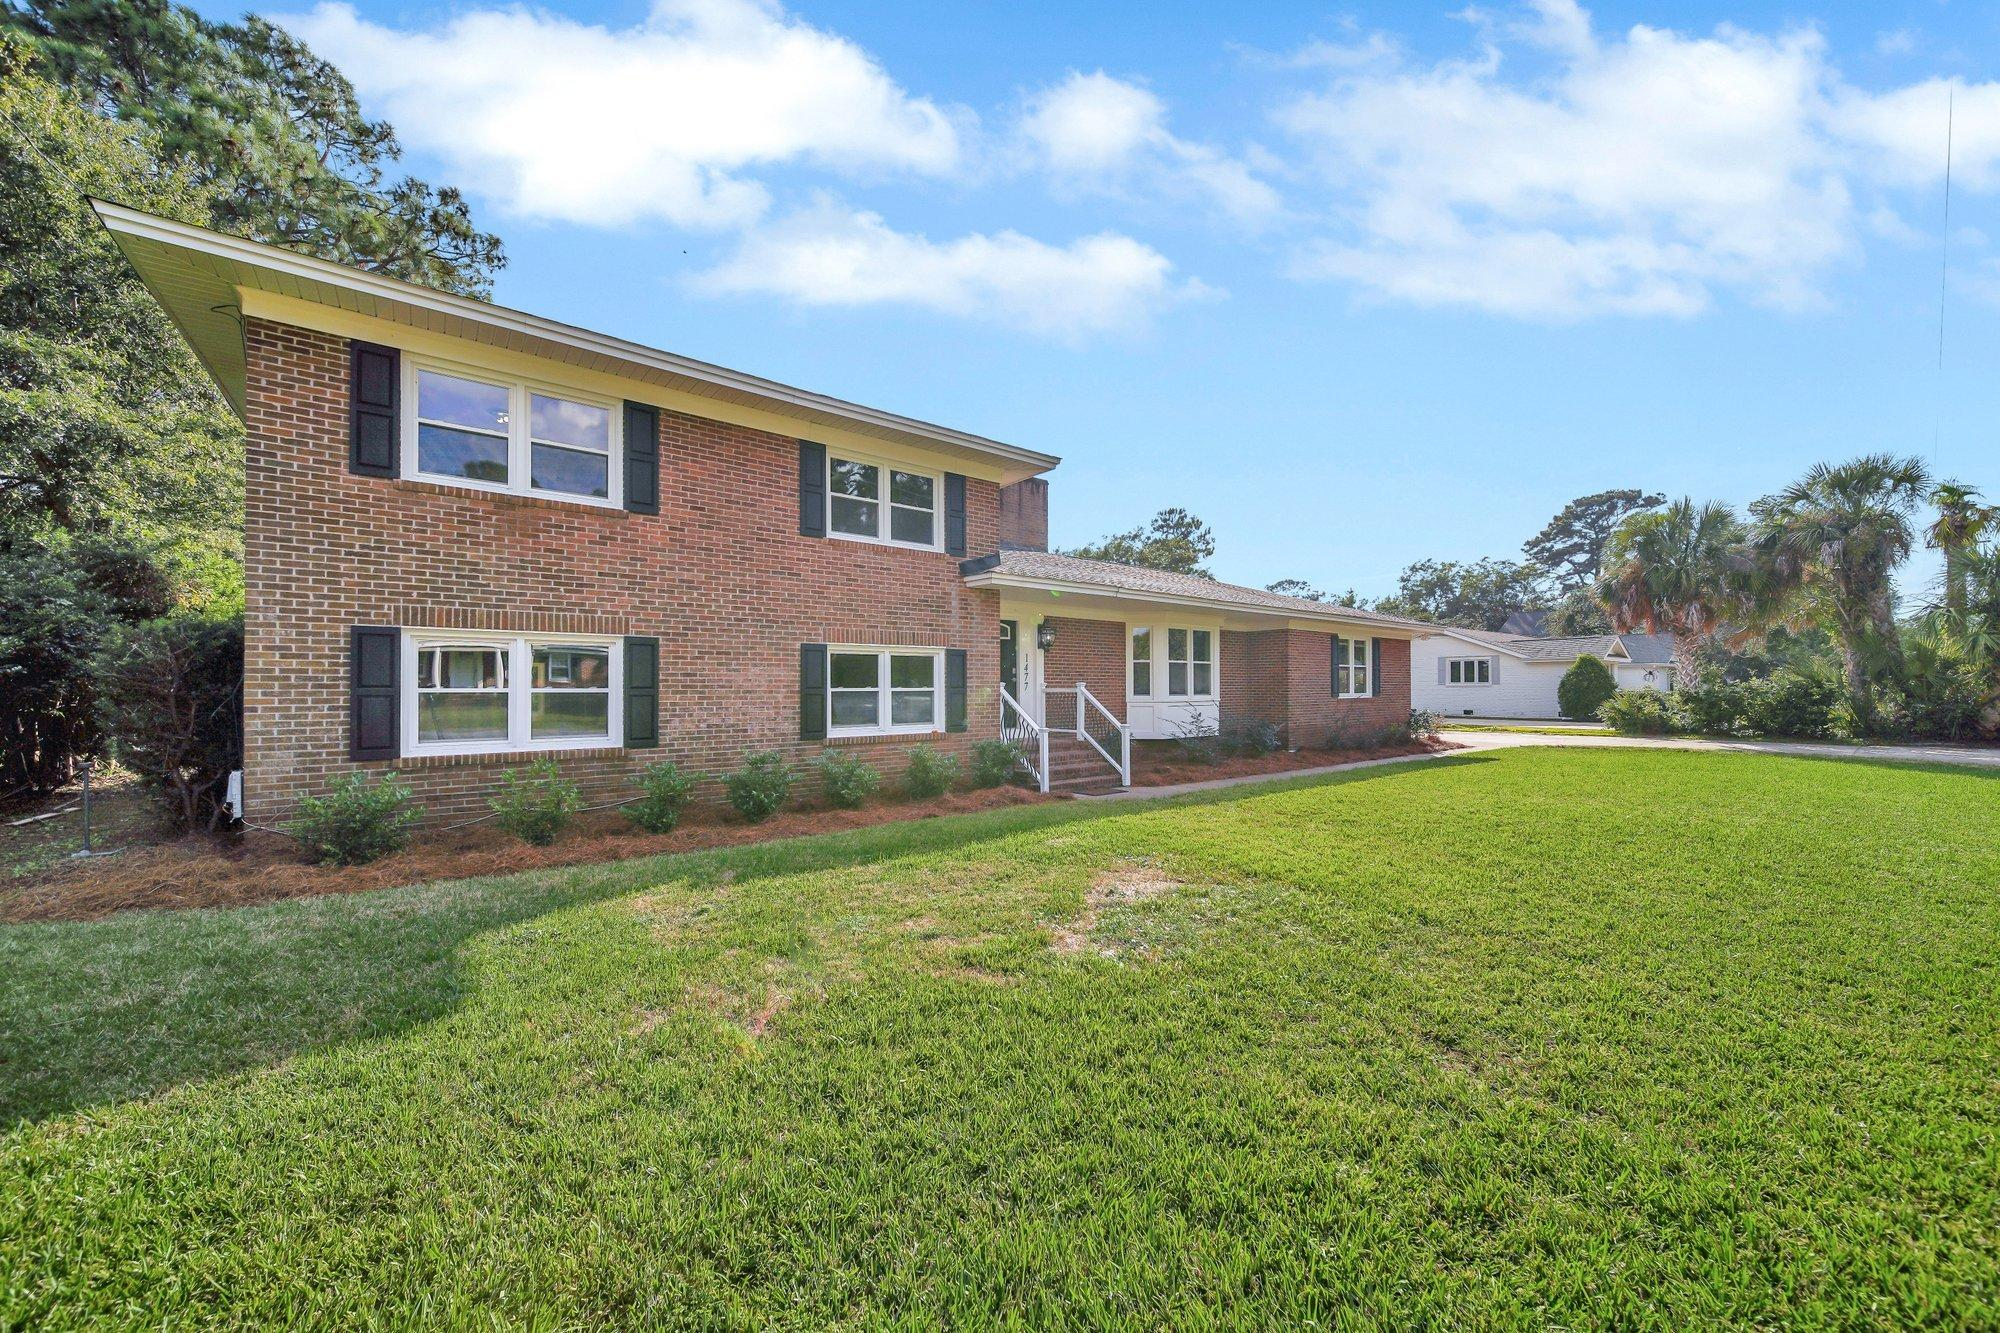 Country Club II Homes For Sale - 1477 Burningtree, Charleston, SC - 33